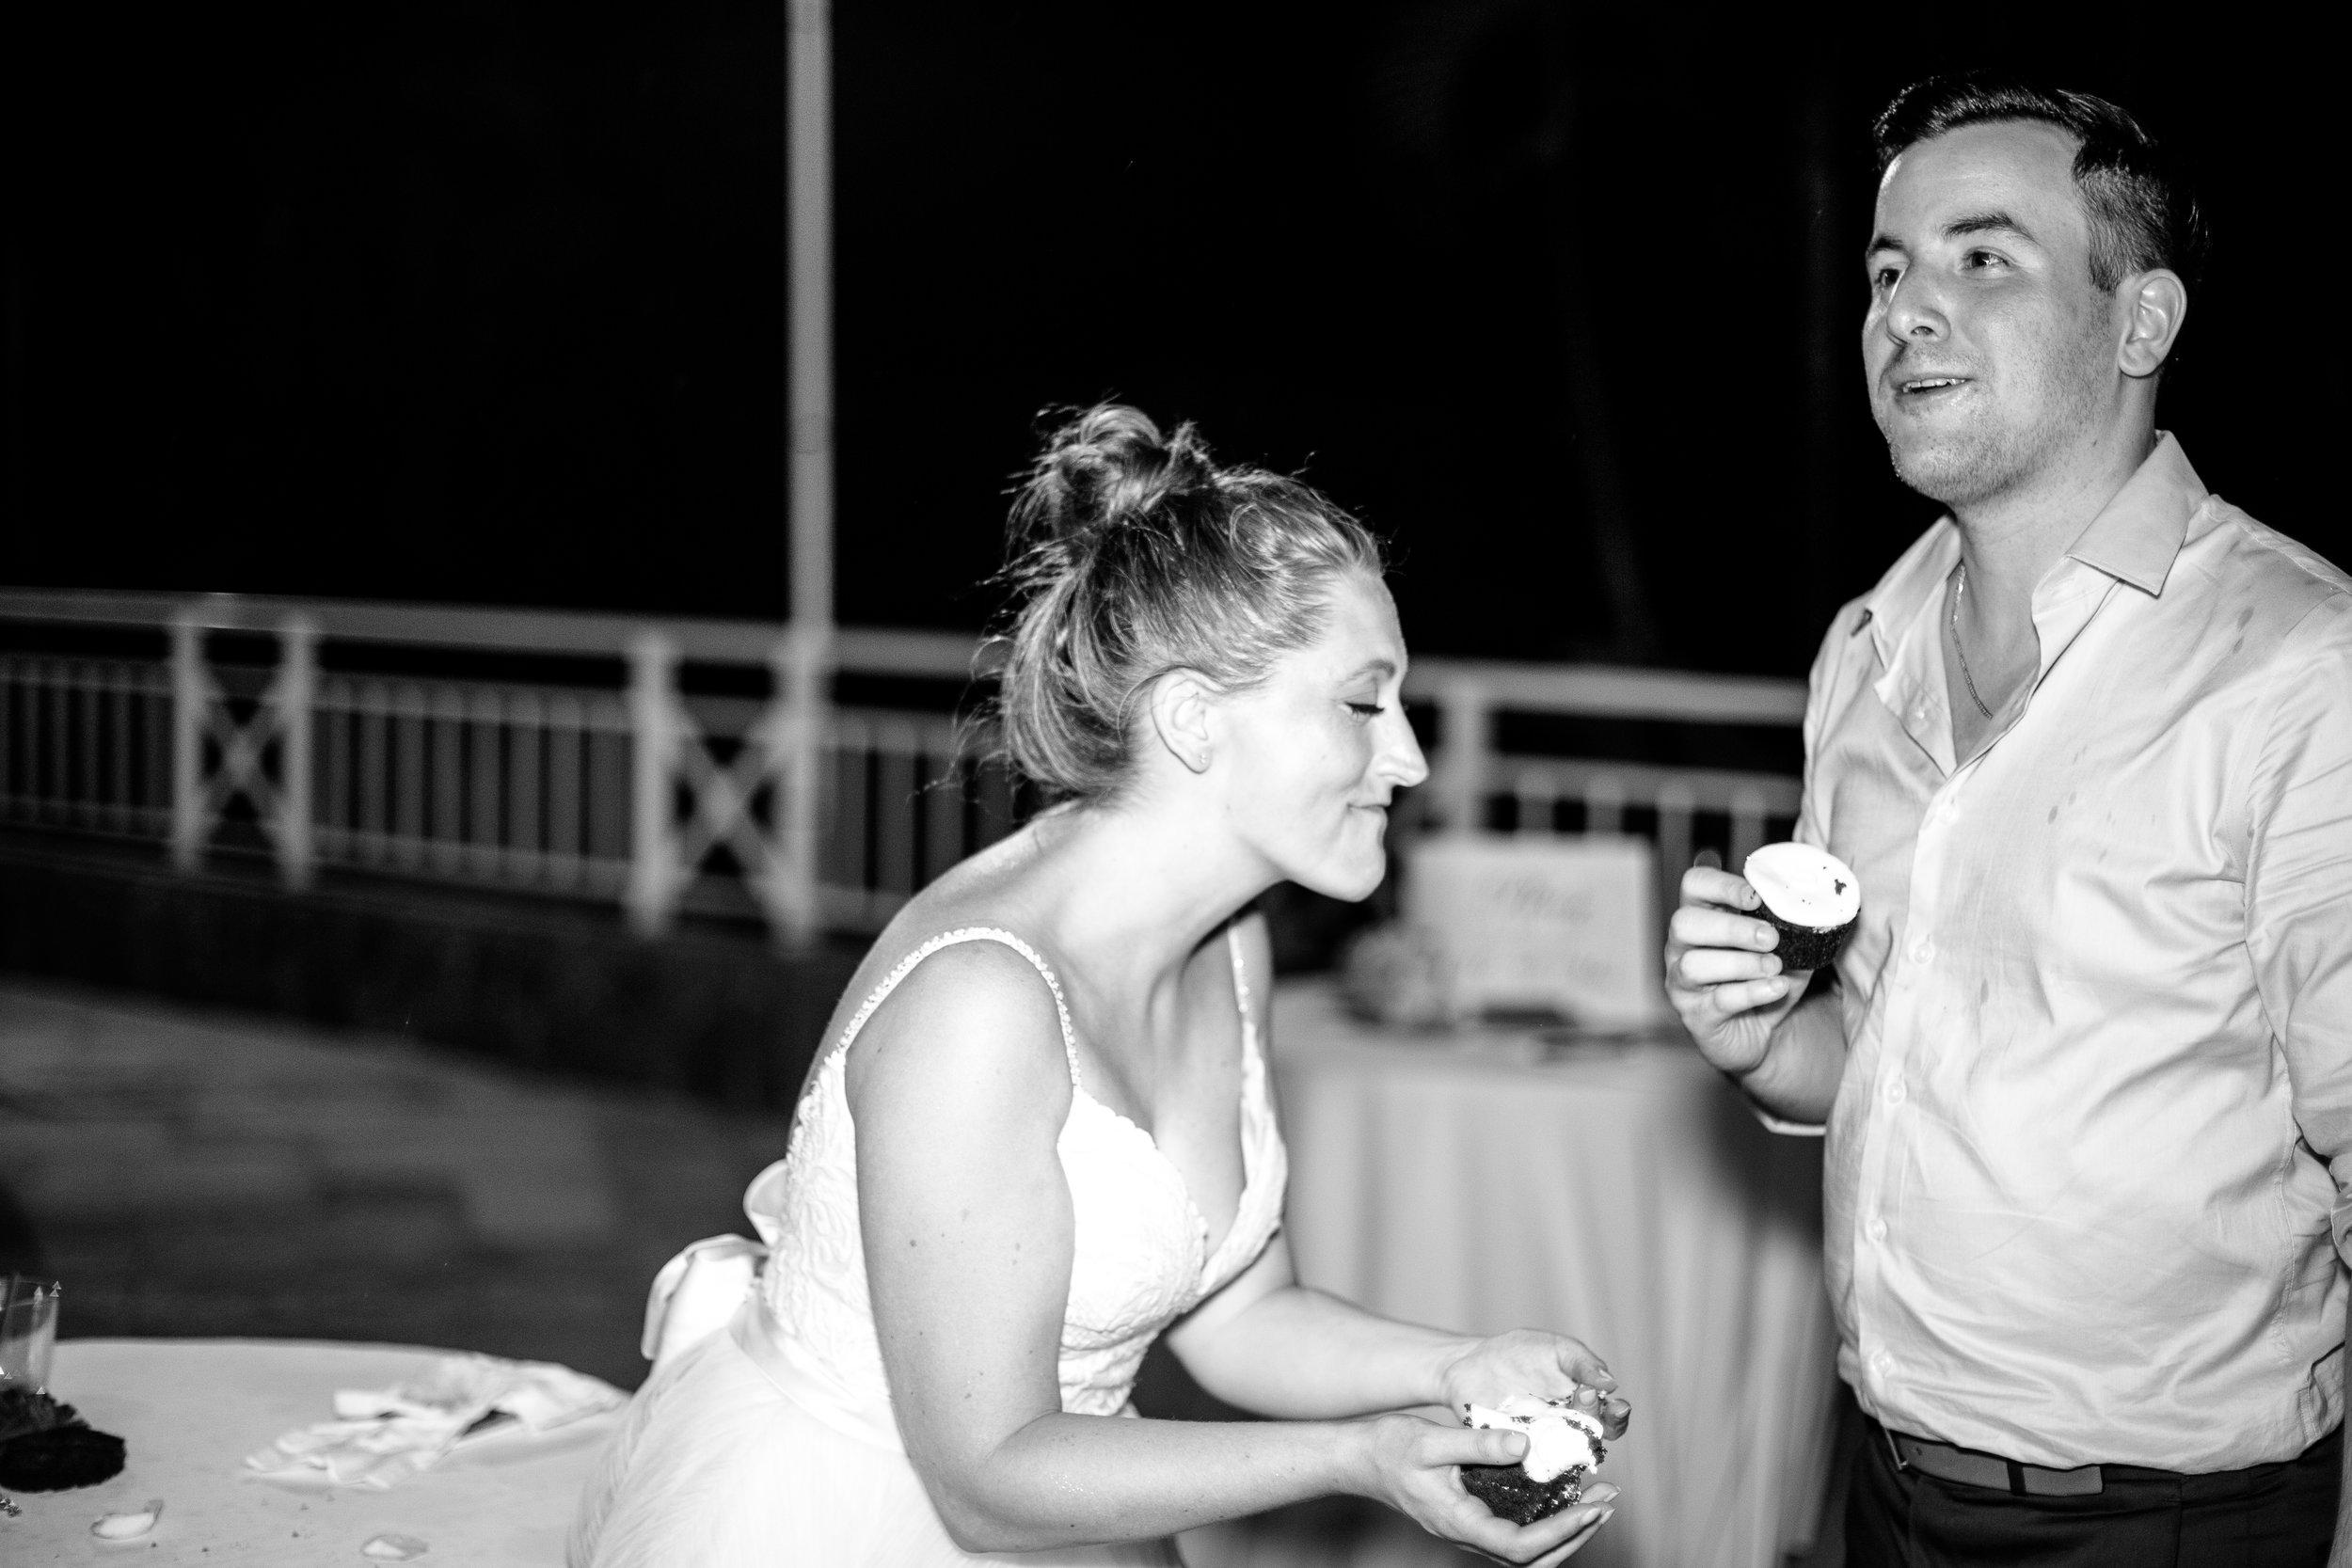 nicole-daacke-photography-destination-wedding-in-st-lucia-sandals-la-toc-intimate-island-wedding-carribean-elopement-photographer-chill-island-wedding-182.jpg